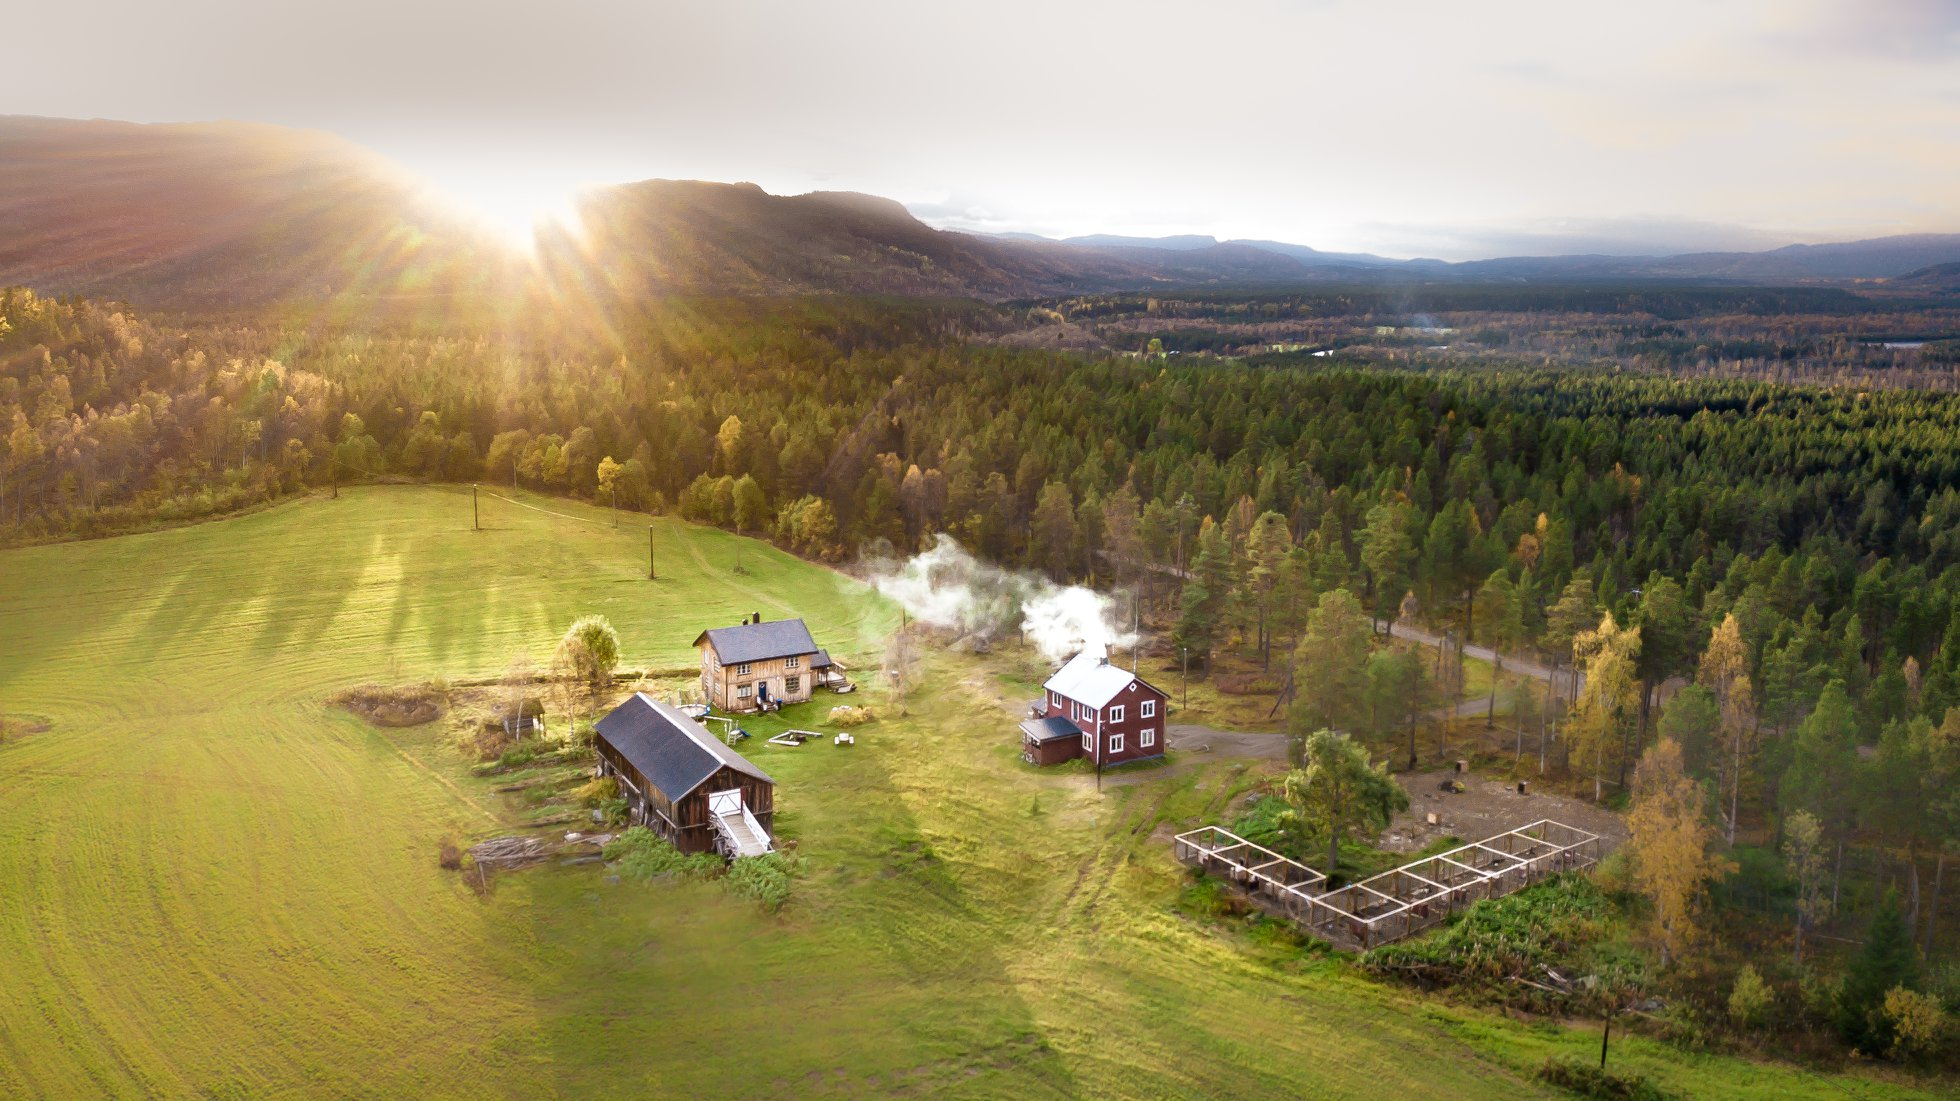 Aurora over the farm